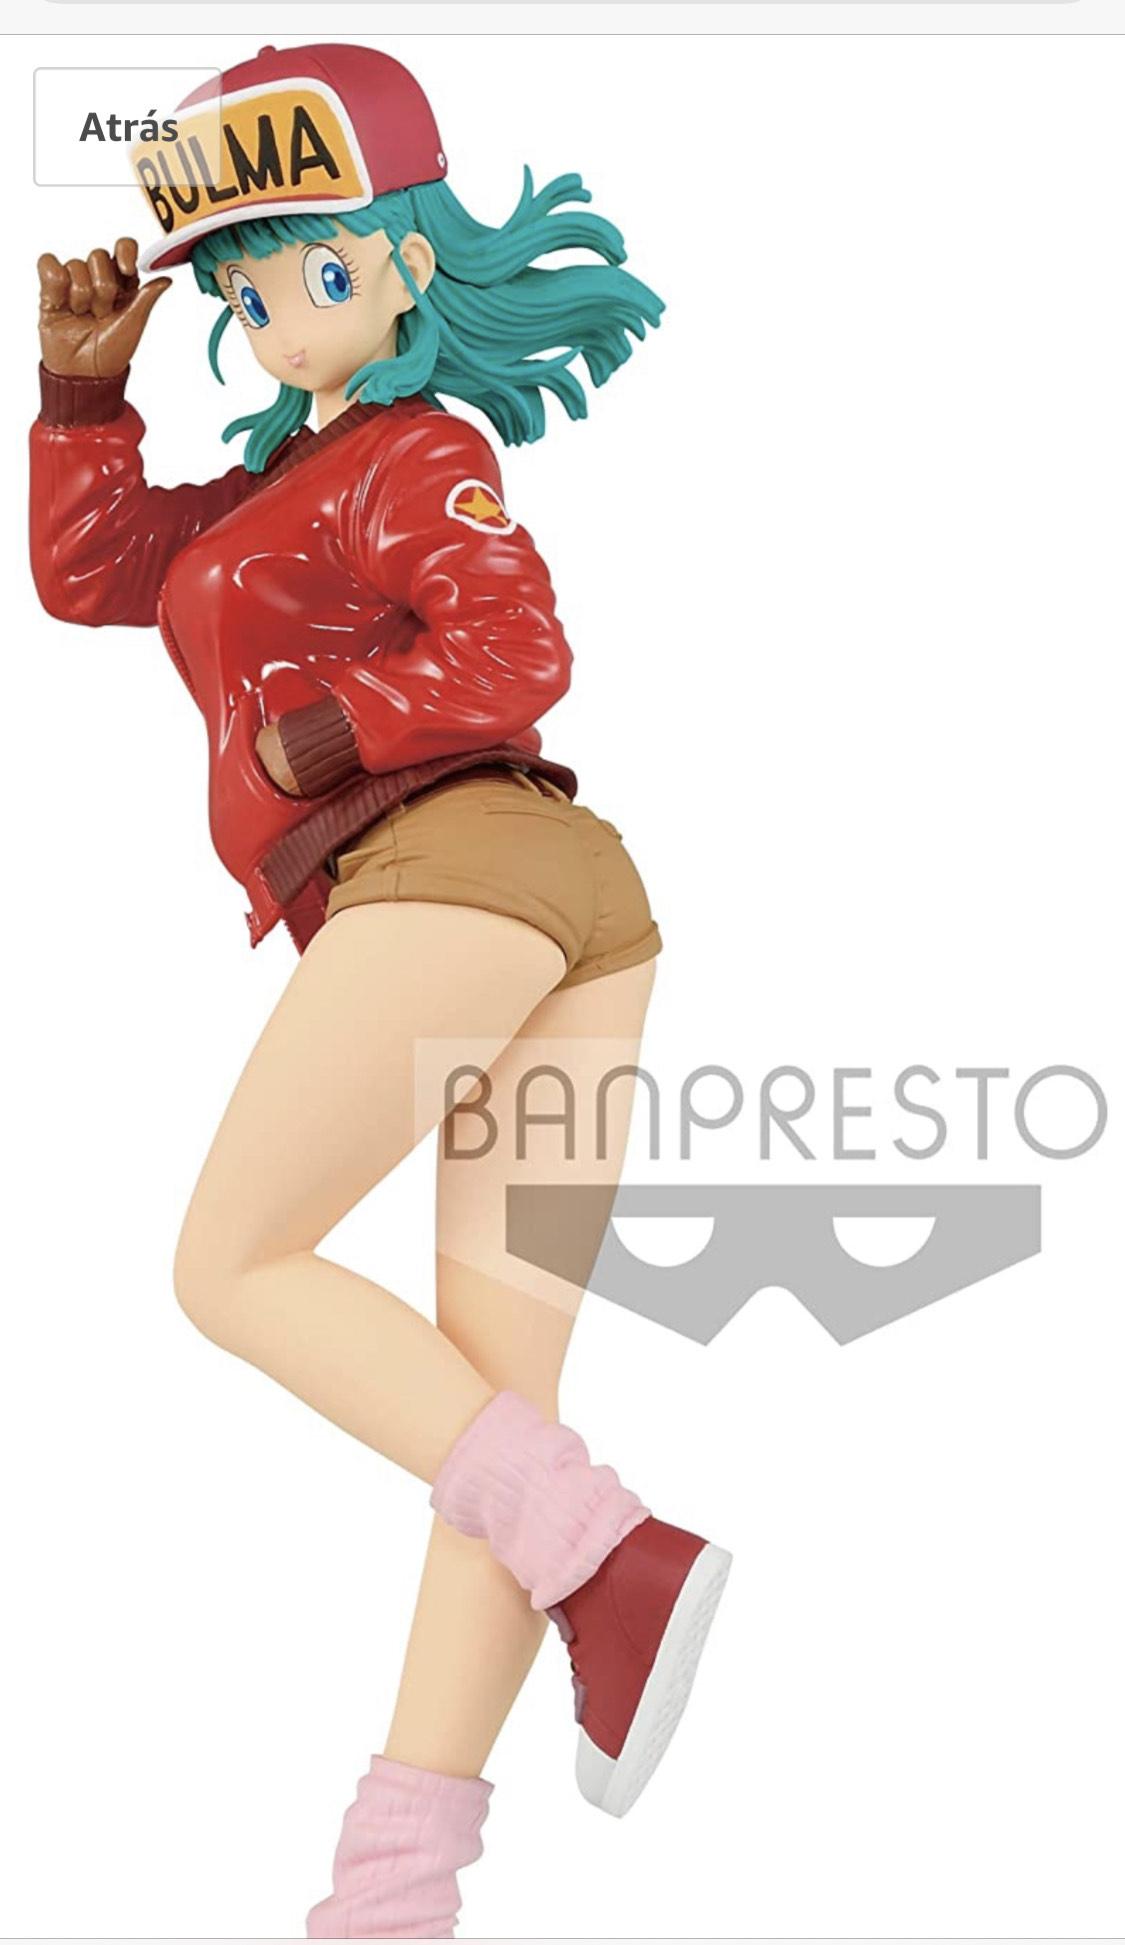 Figura Banpresto Bulma (Vendedor externo)